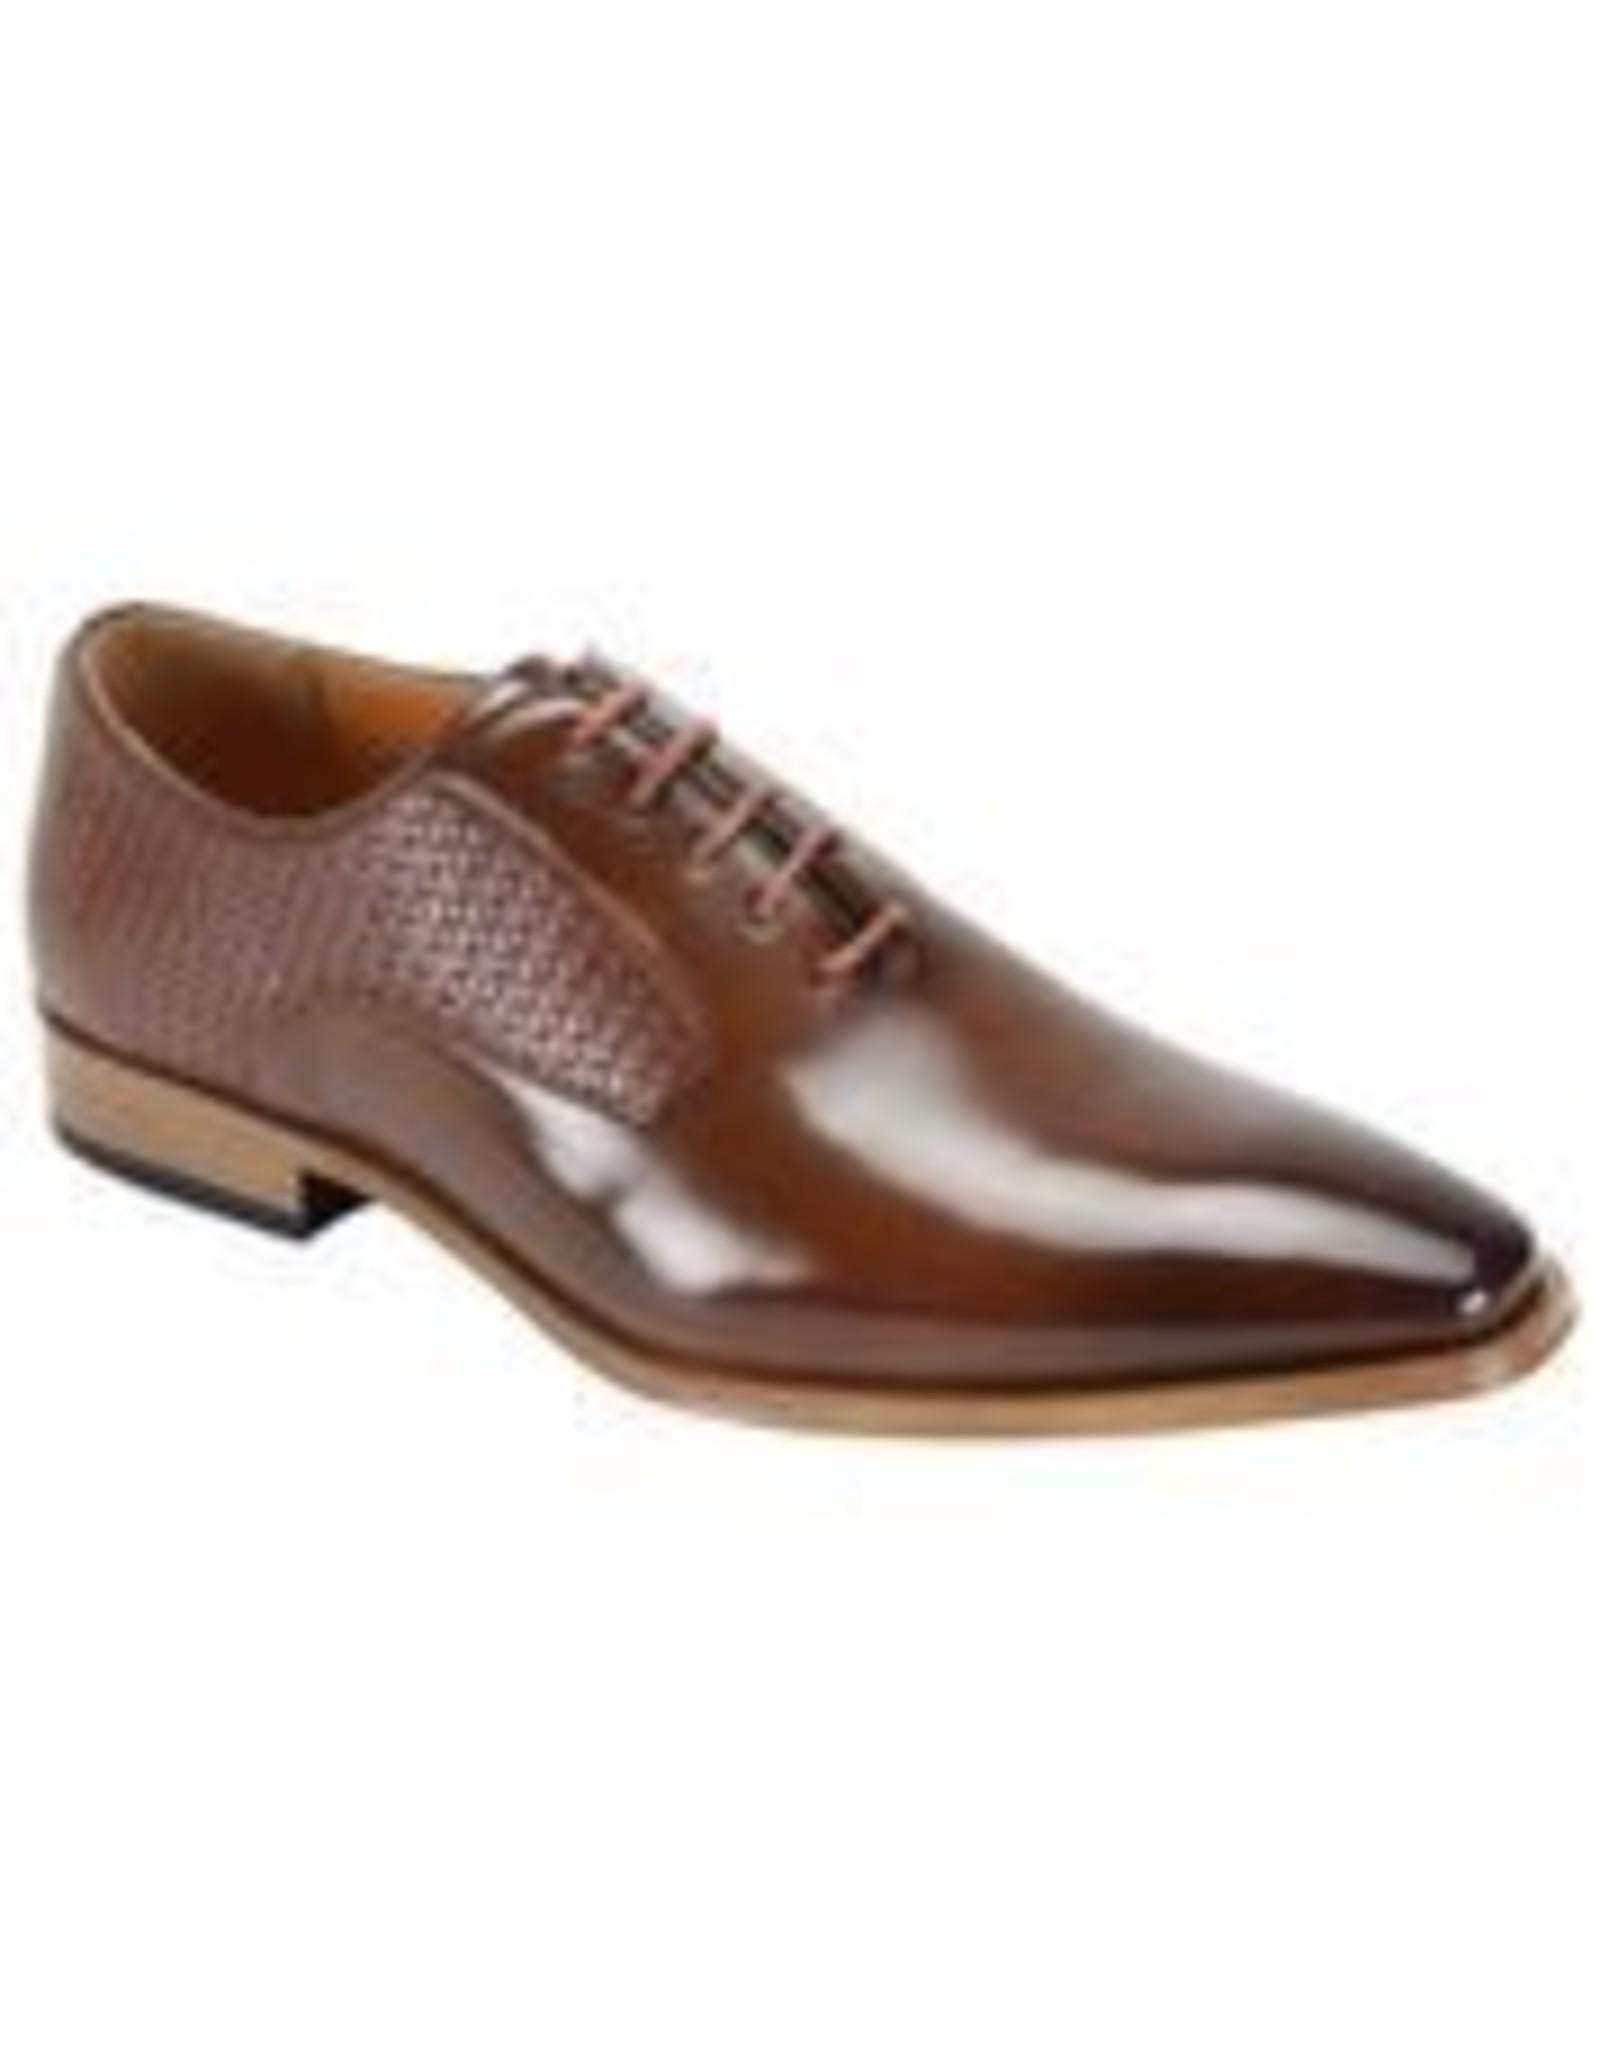 Steven Land Steven Land Dress Shoe - SL0089 Cognac